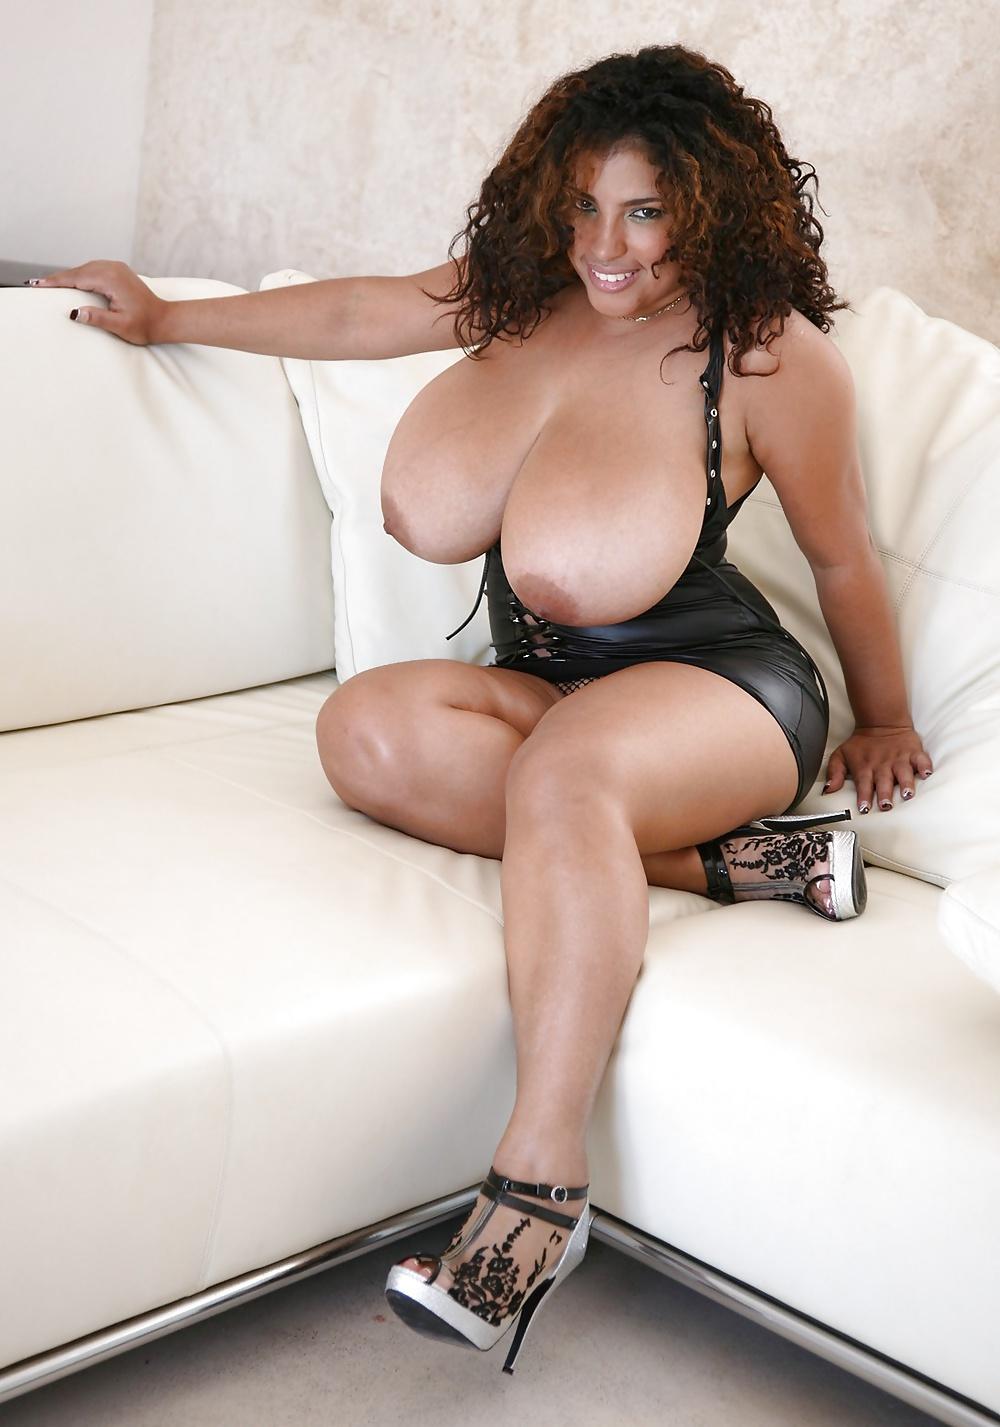 Nude beaches dominican republic women